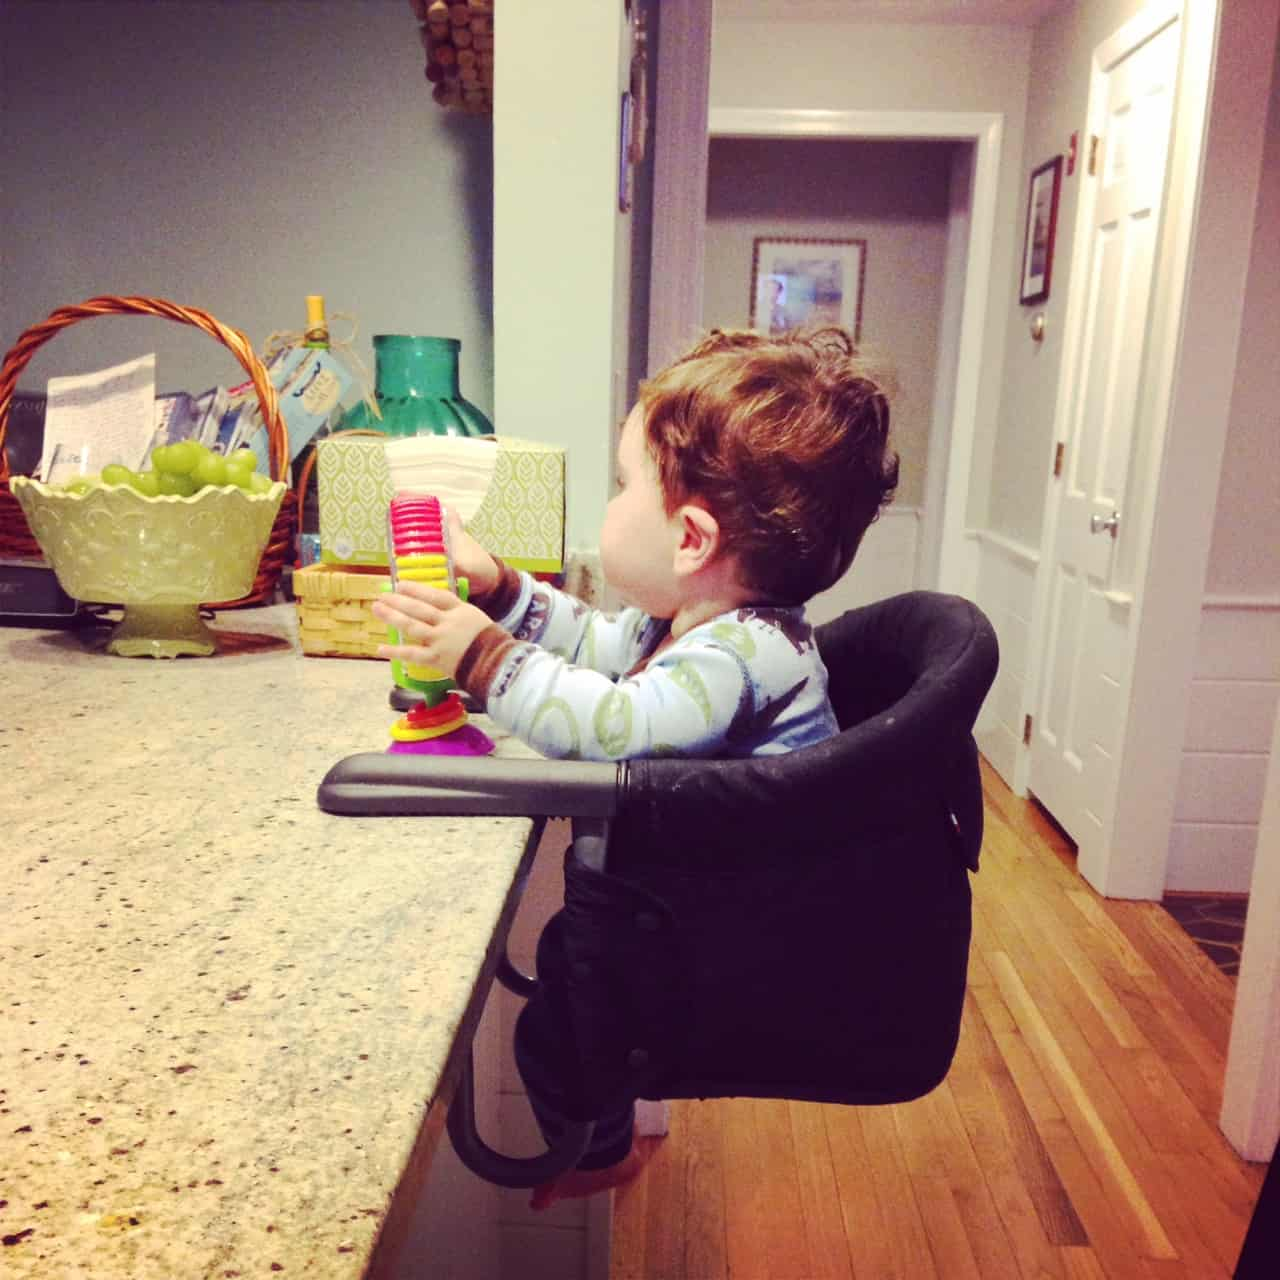 Inglesina fast table chair marina - Inglesina Fast Table Chair Img4263 Jr Chair Mimijuji Baby Bottle 3oz Photo 2